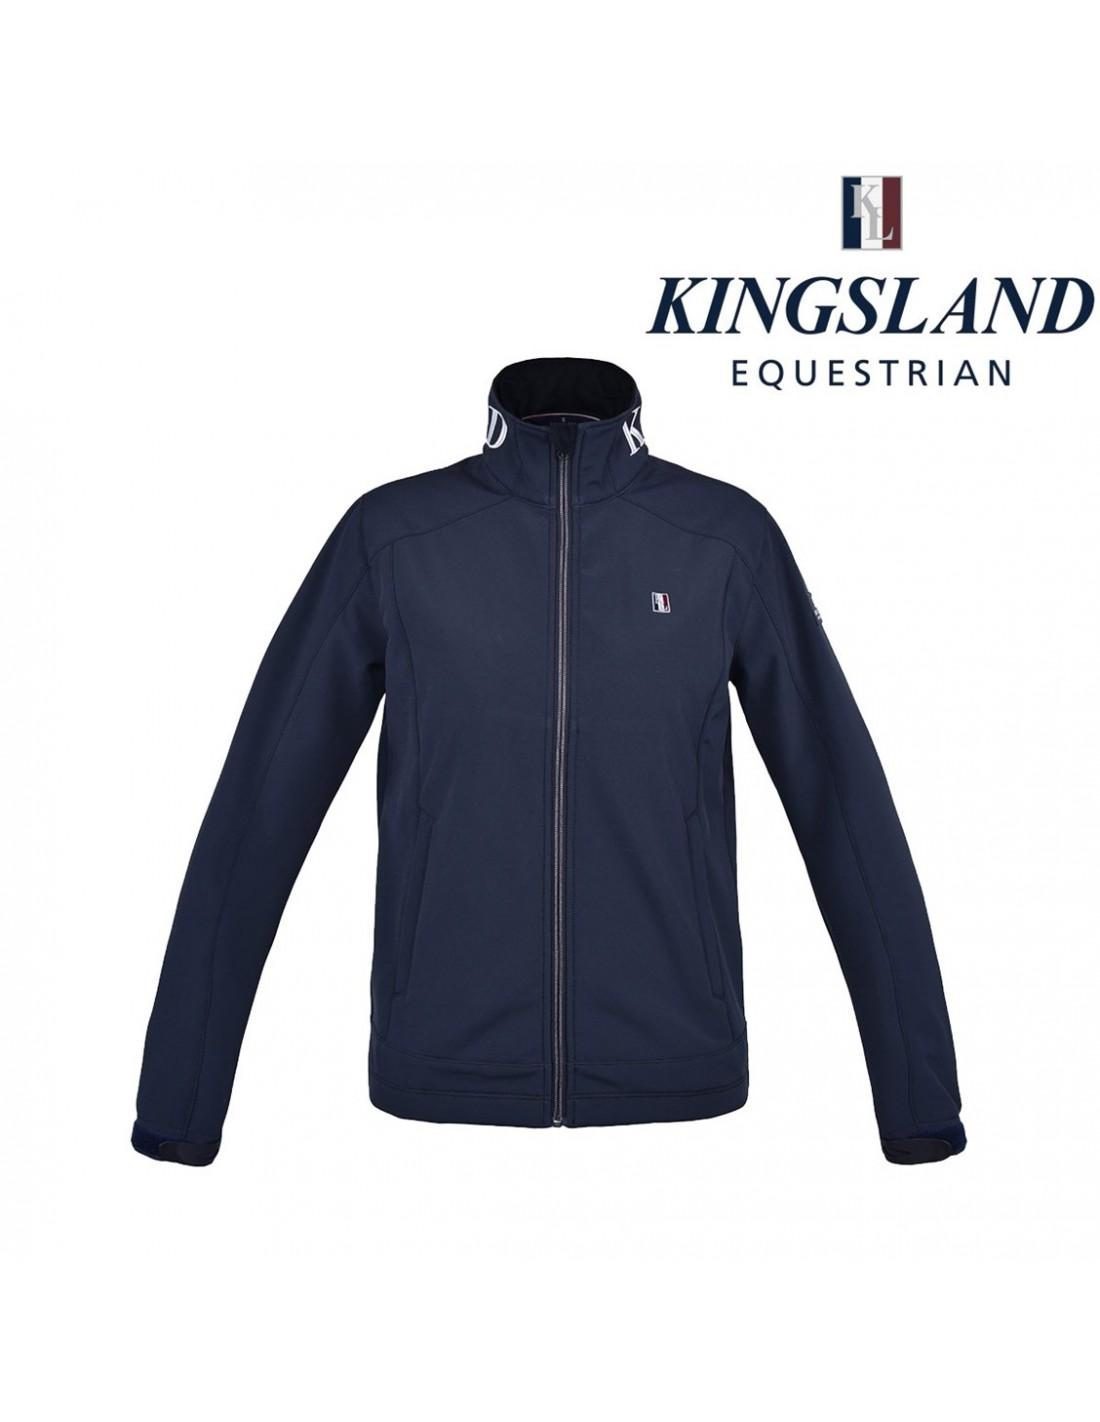 Kingsland Classic Horse Riding Jacket